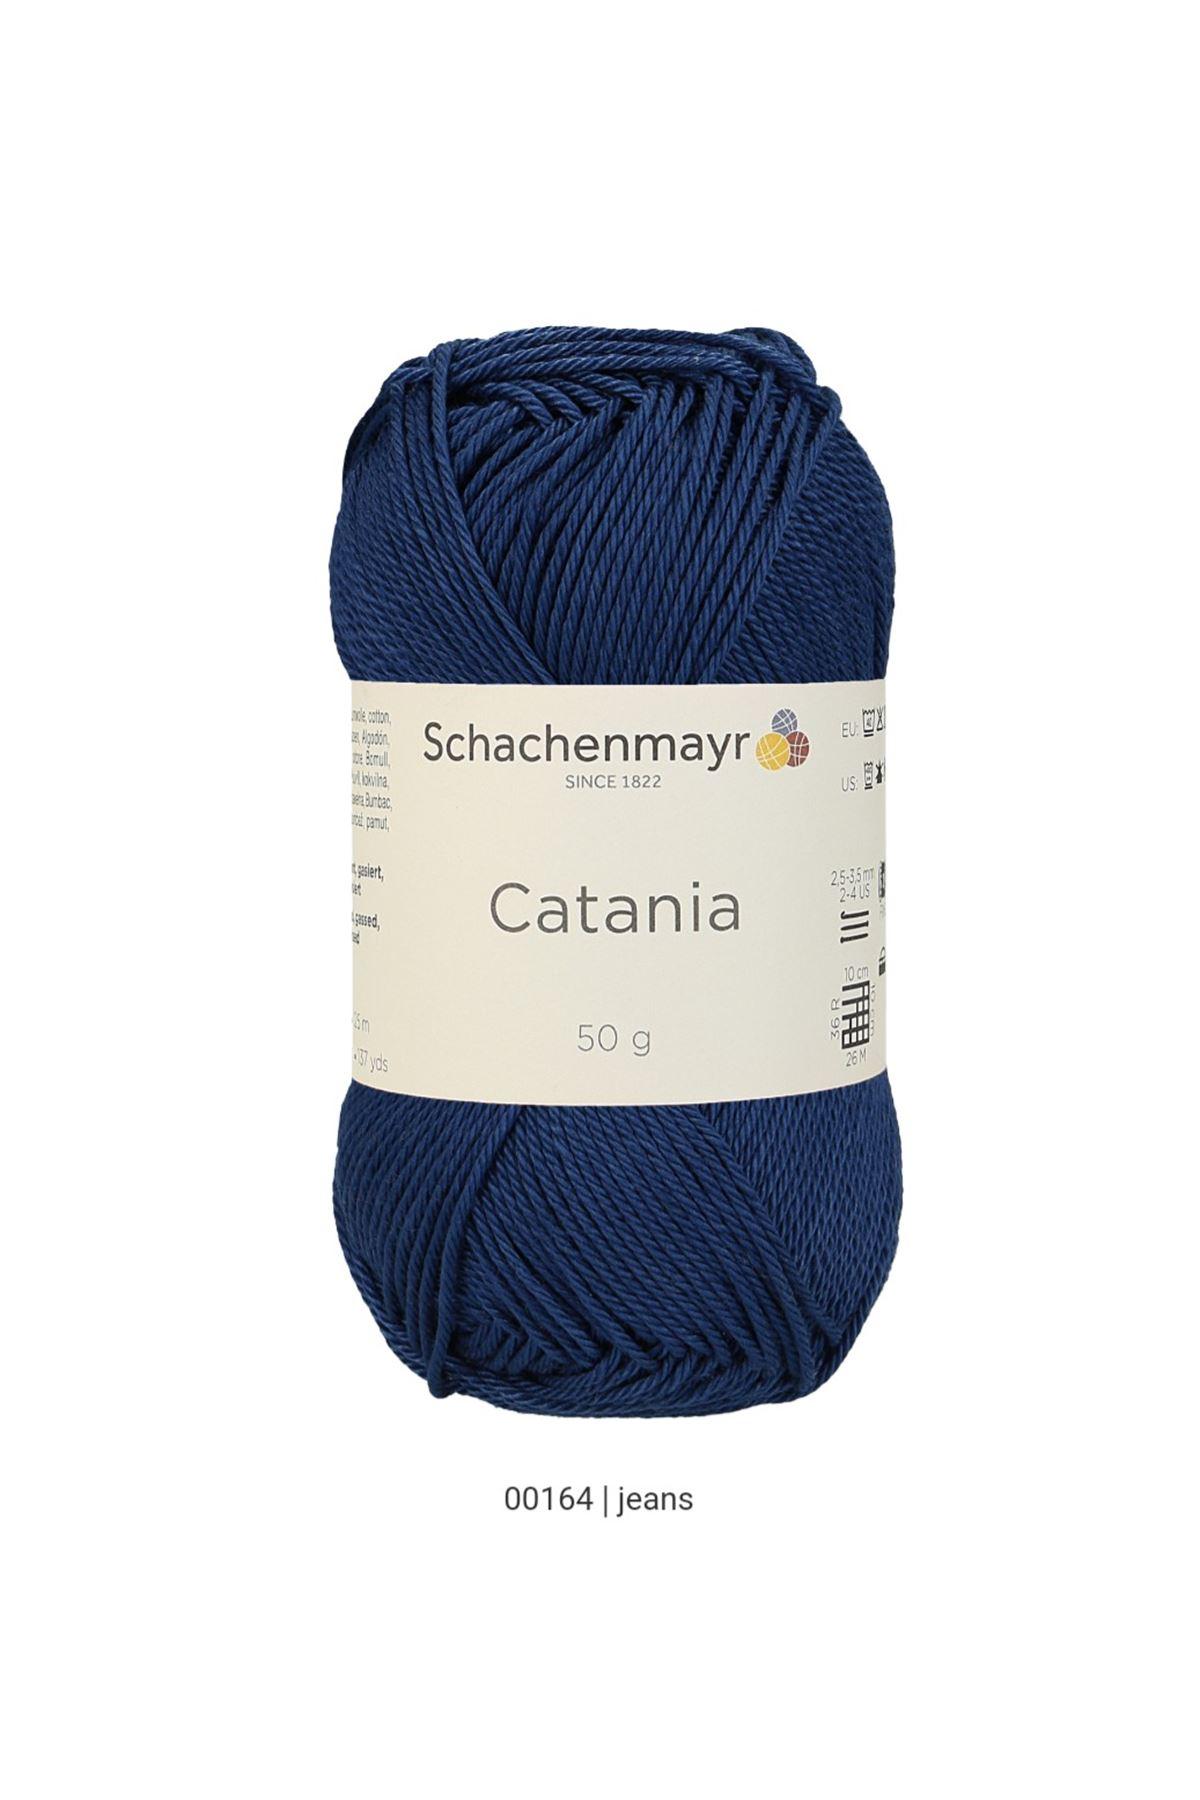 SMC Catania 50g 00164 Jeans Mavi